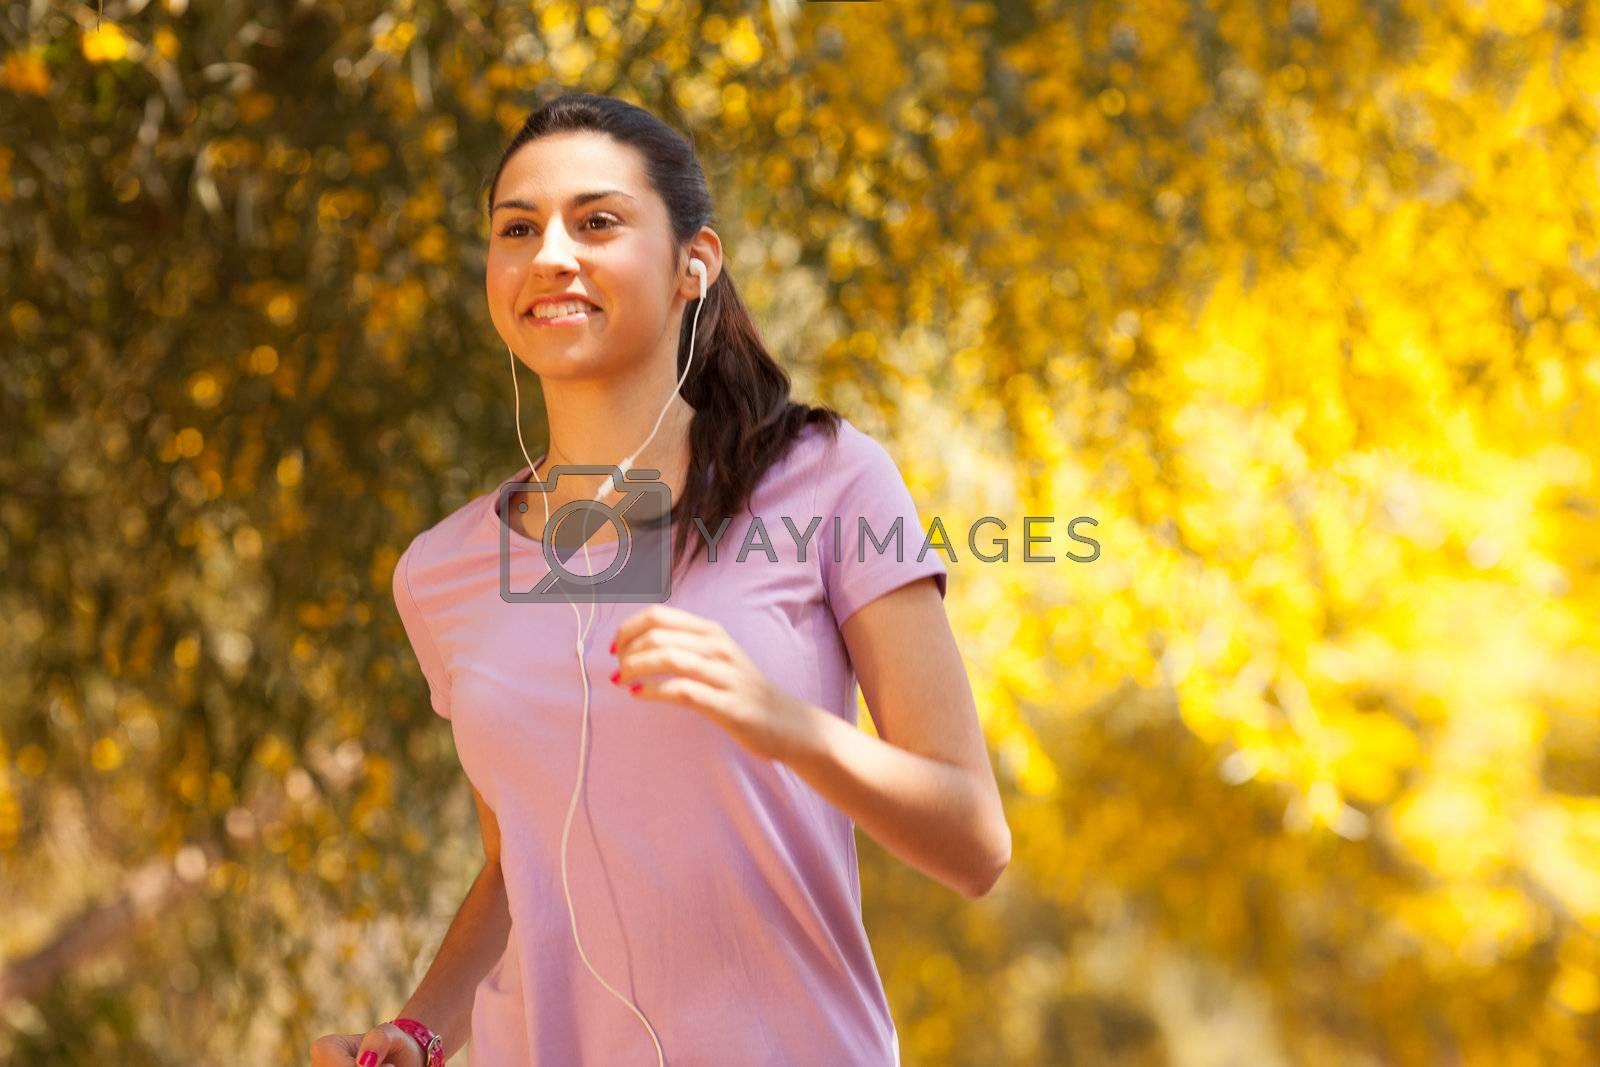 young beautiful woman jogging outdoors